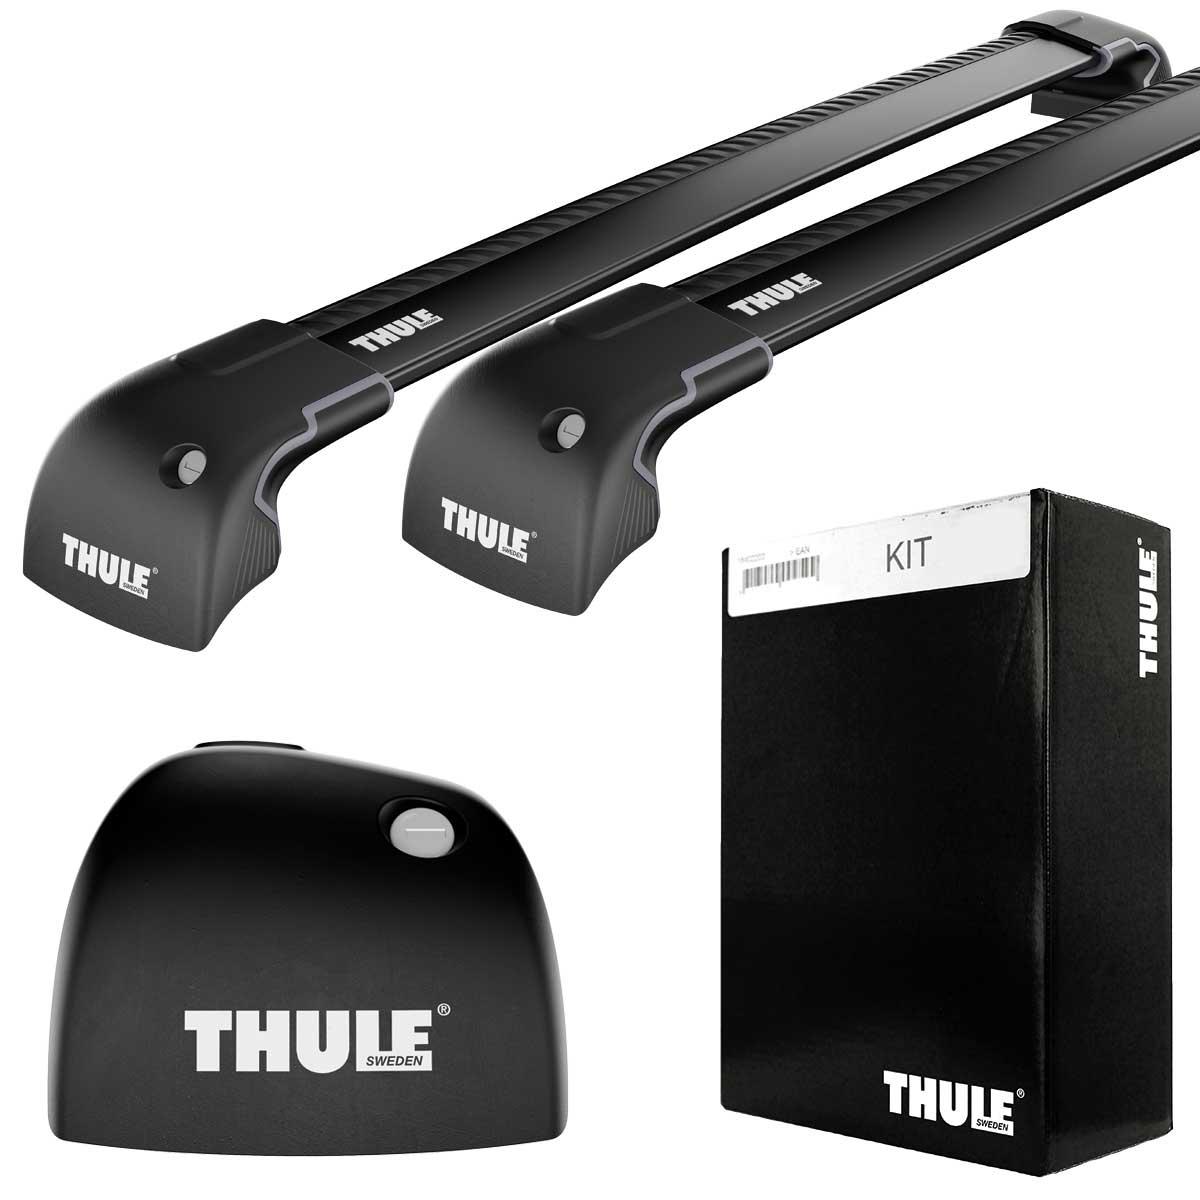 BMW - Thule WingBar Edge Black 959220 + Kit 4023